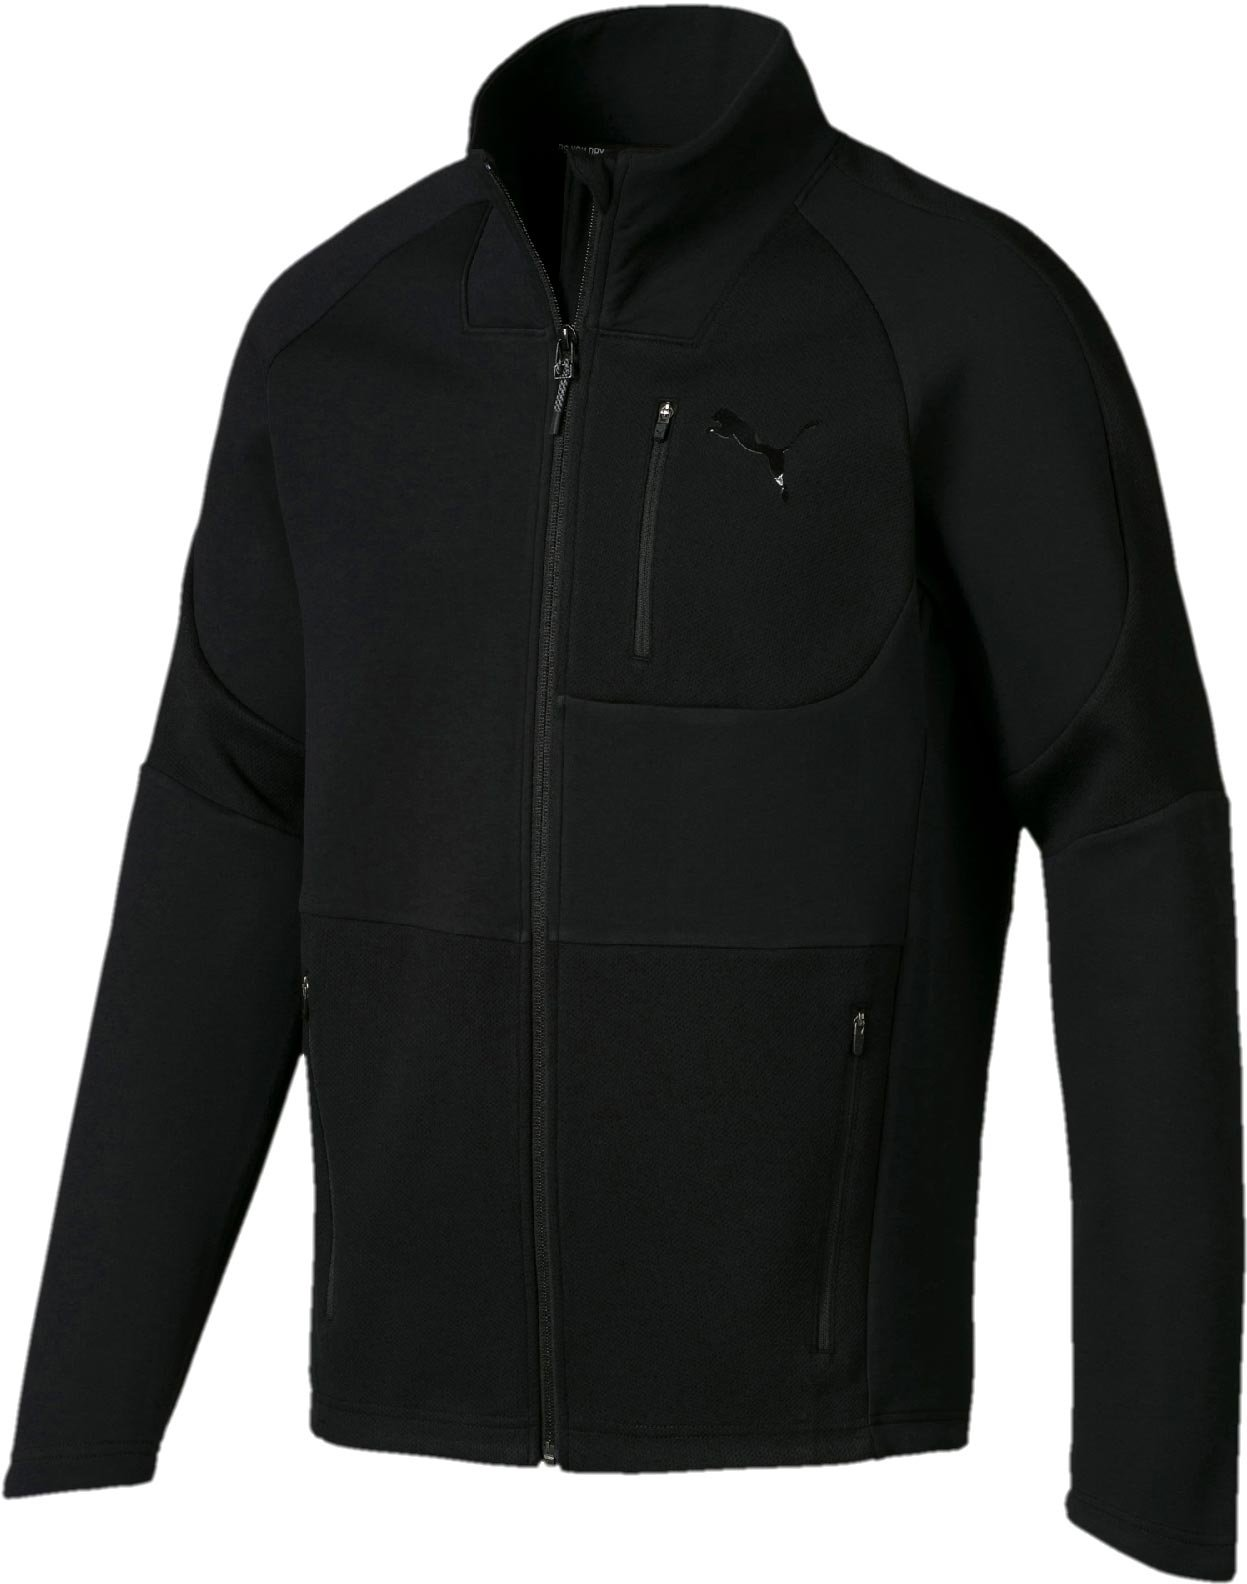 Puma Evostripe Move Jacket S